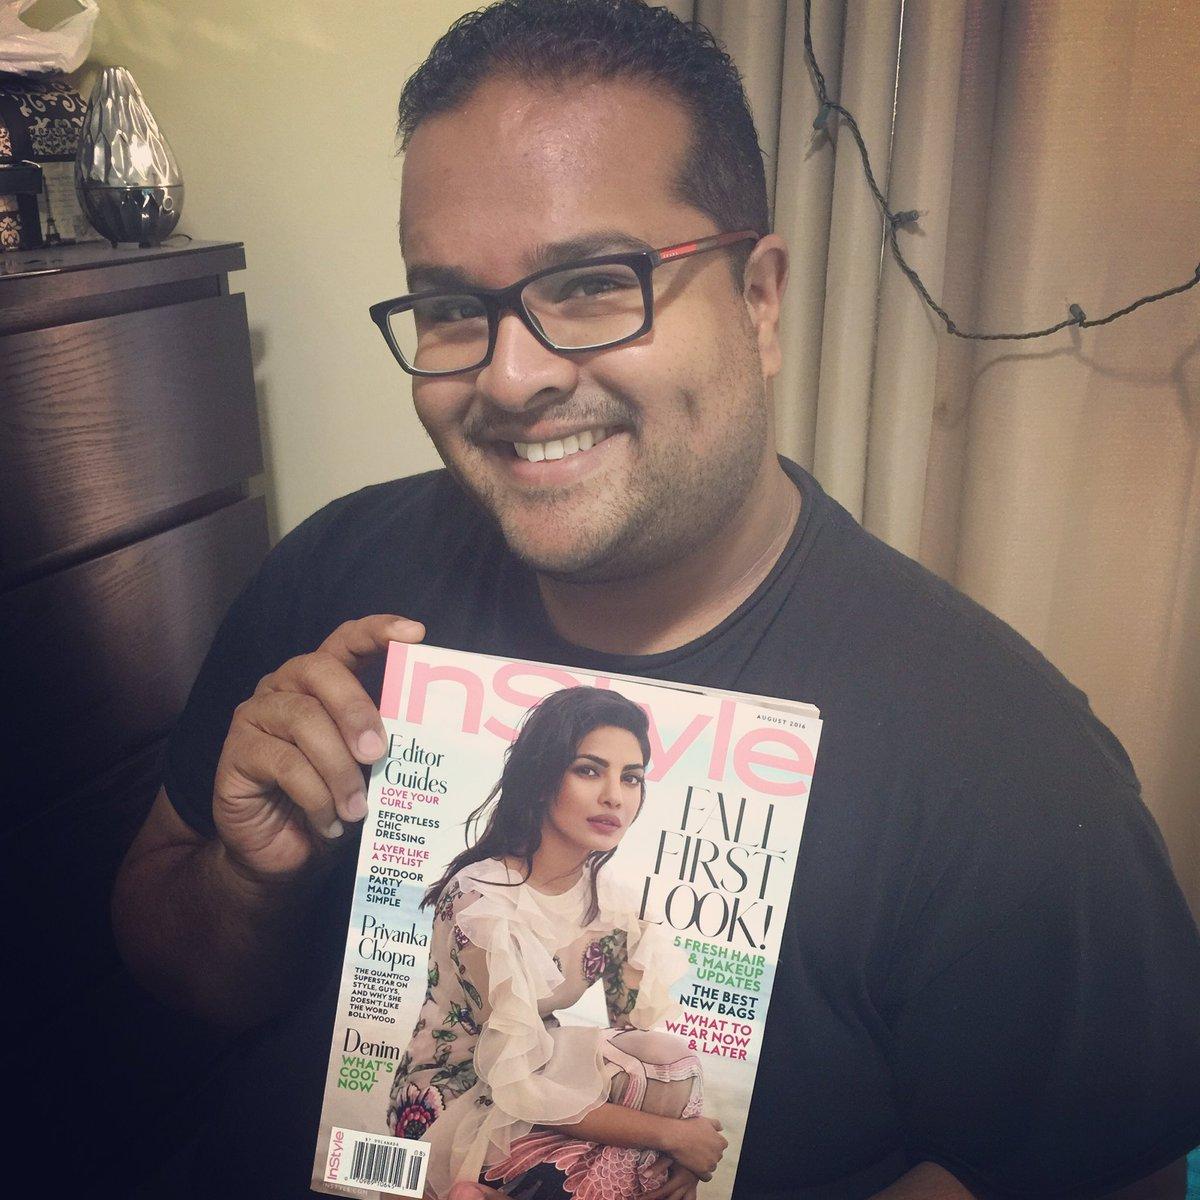 My love. @priyankachopra ❤️ @instylemagazine https://t.co/VJeGiIgTRJ